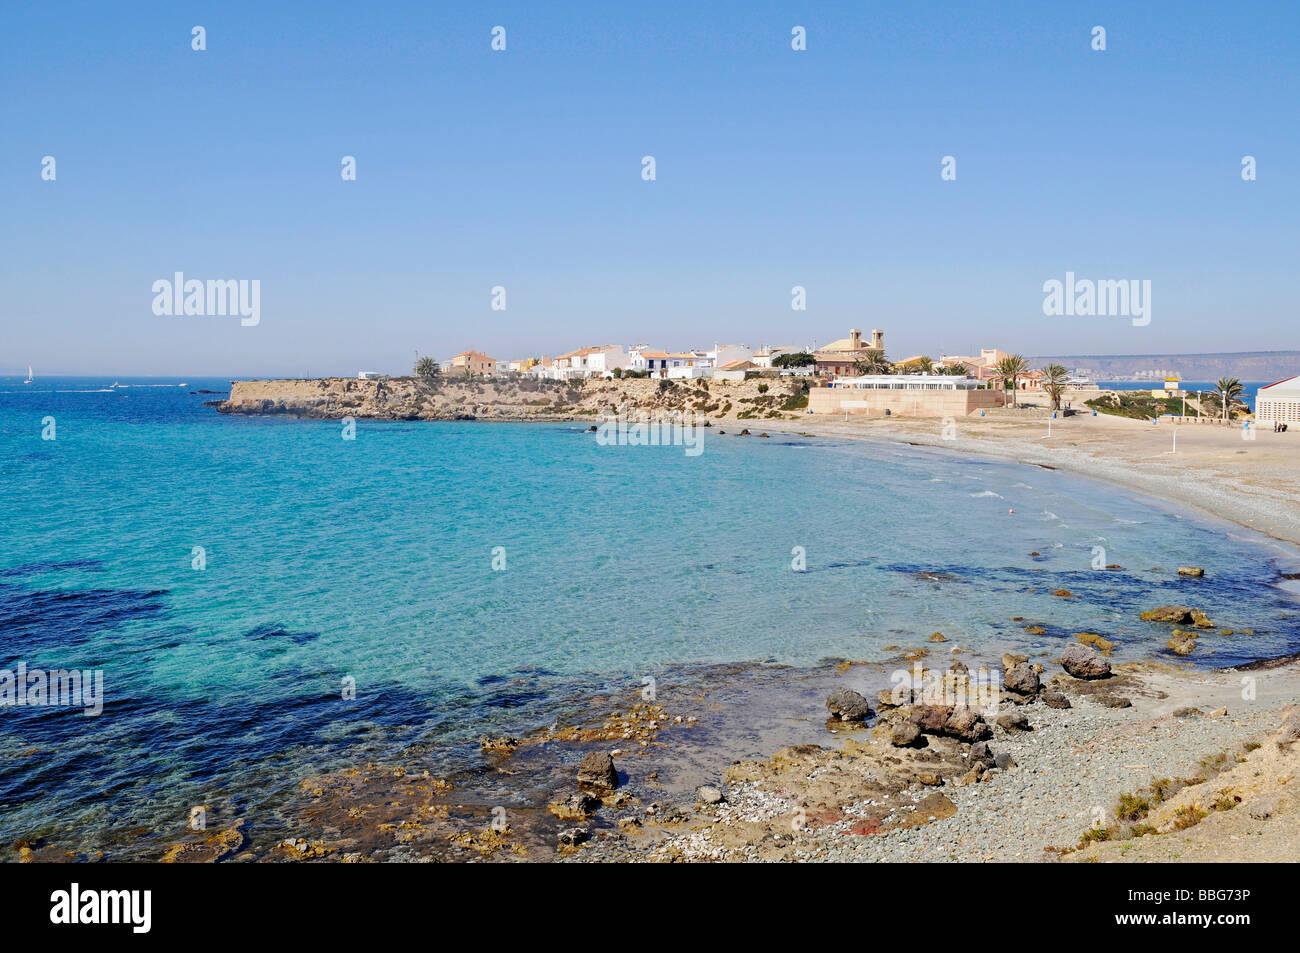 Beach bay tabarca isla de tabarca alicante costa - Hoteles en isla tabarca ...